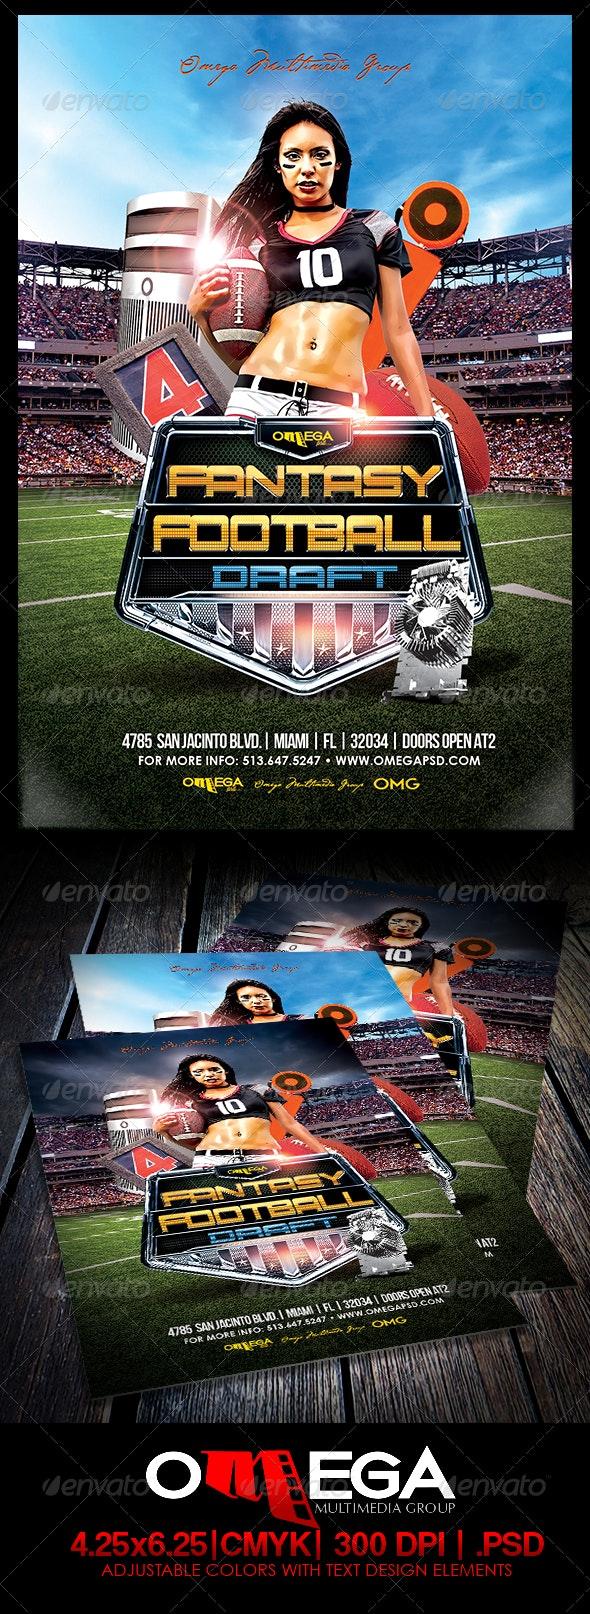 Fantasy Football Draft - Events Flyers